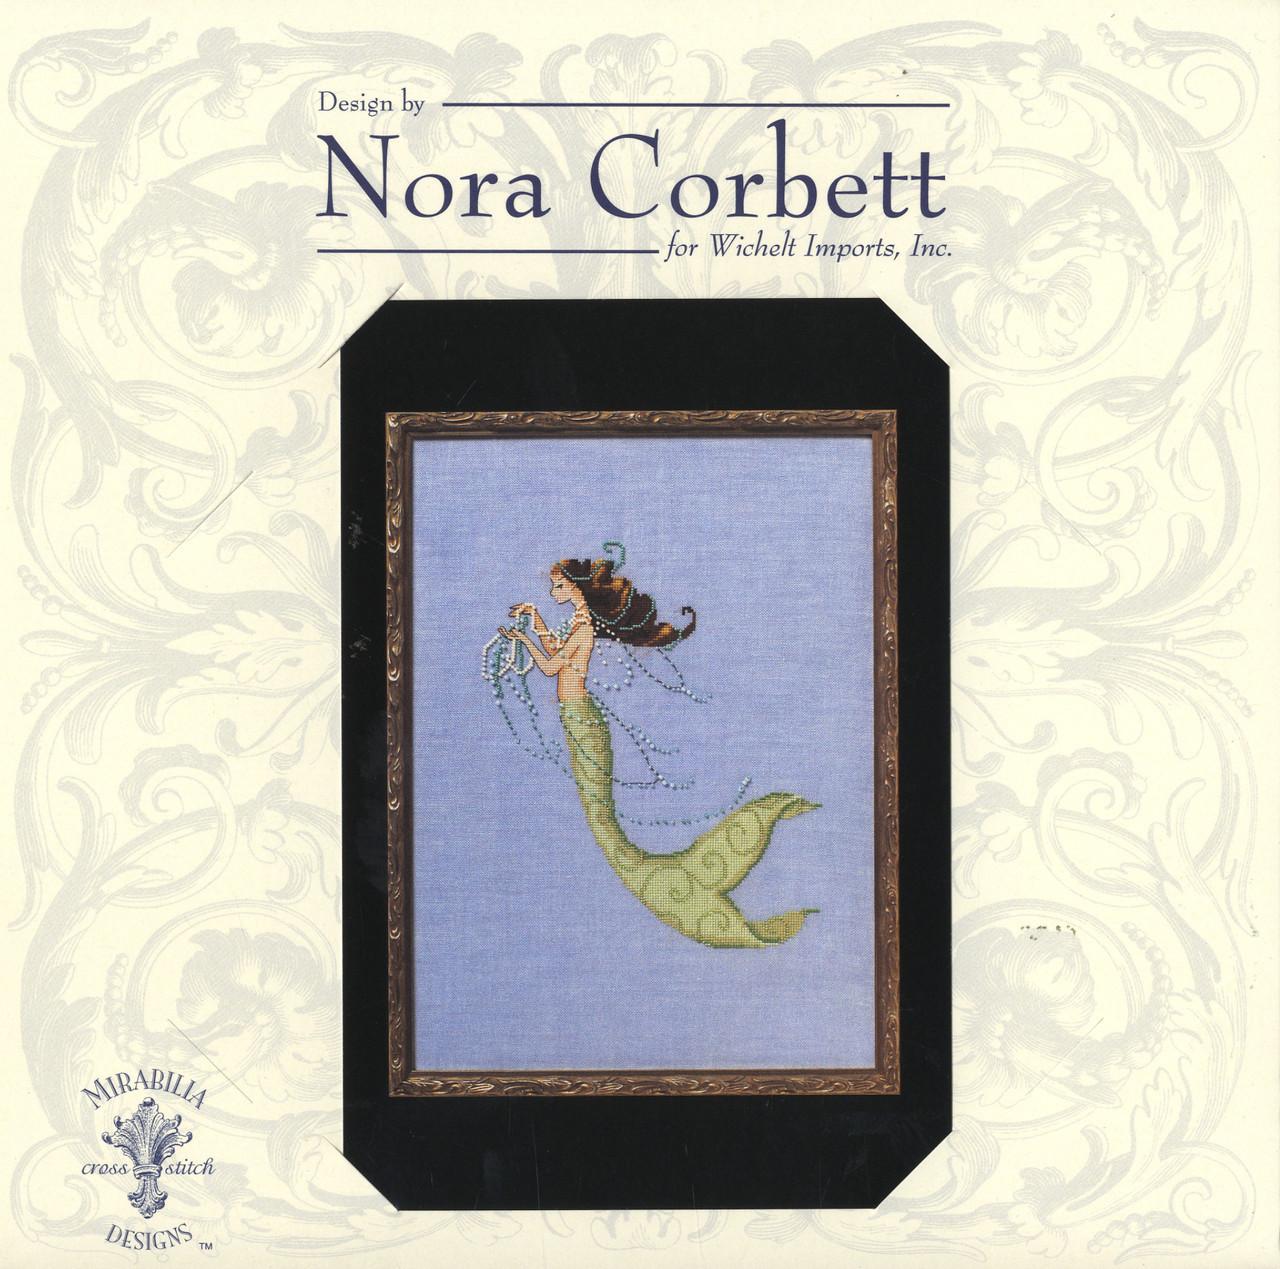 Nora Corbett - Tesoro Mia